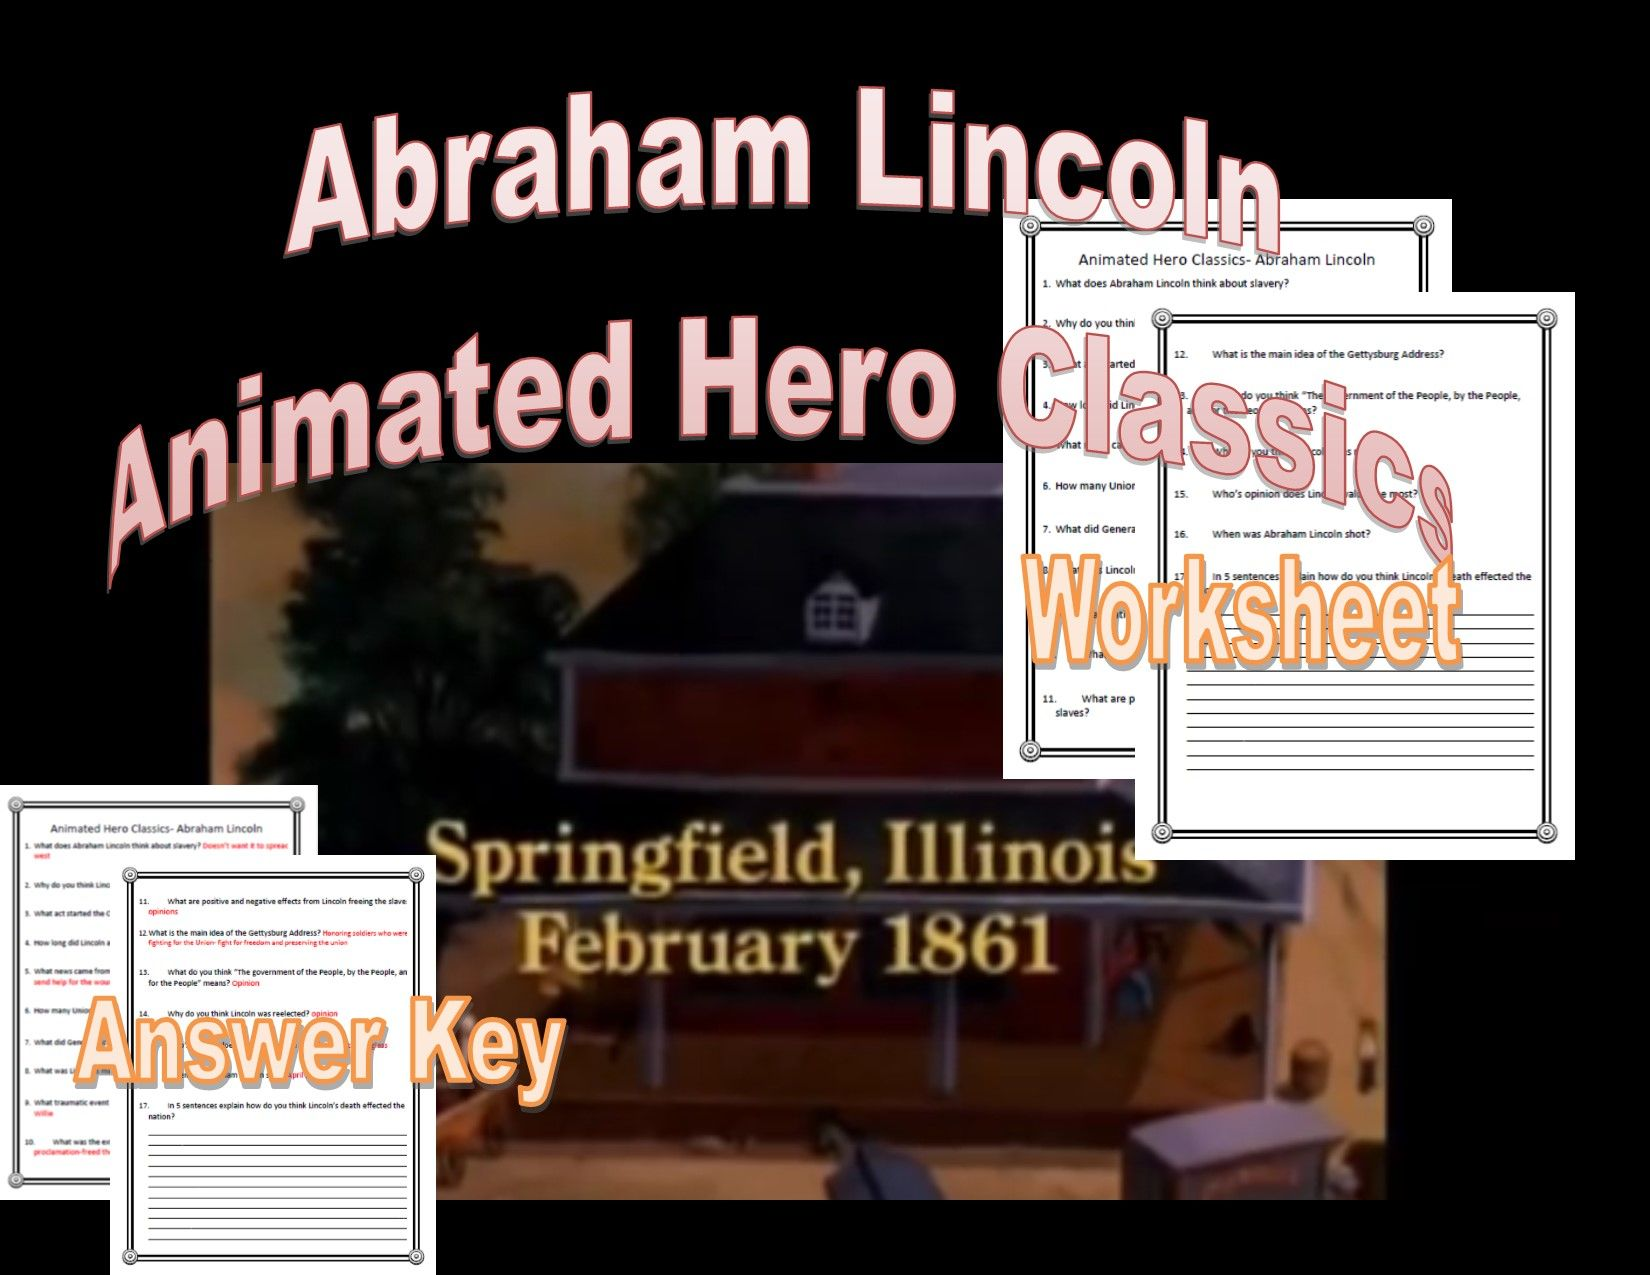 Abraham Lincoln Animated Hero Classics Cartoon Video